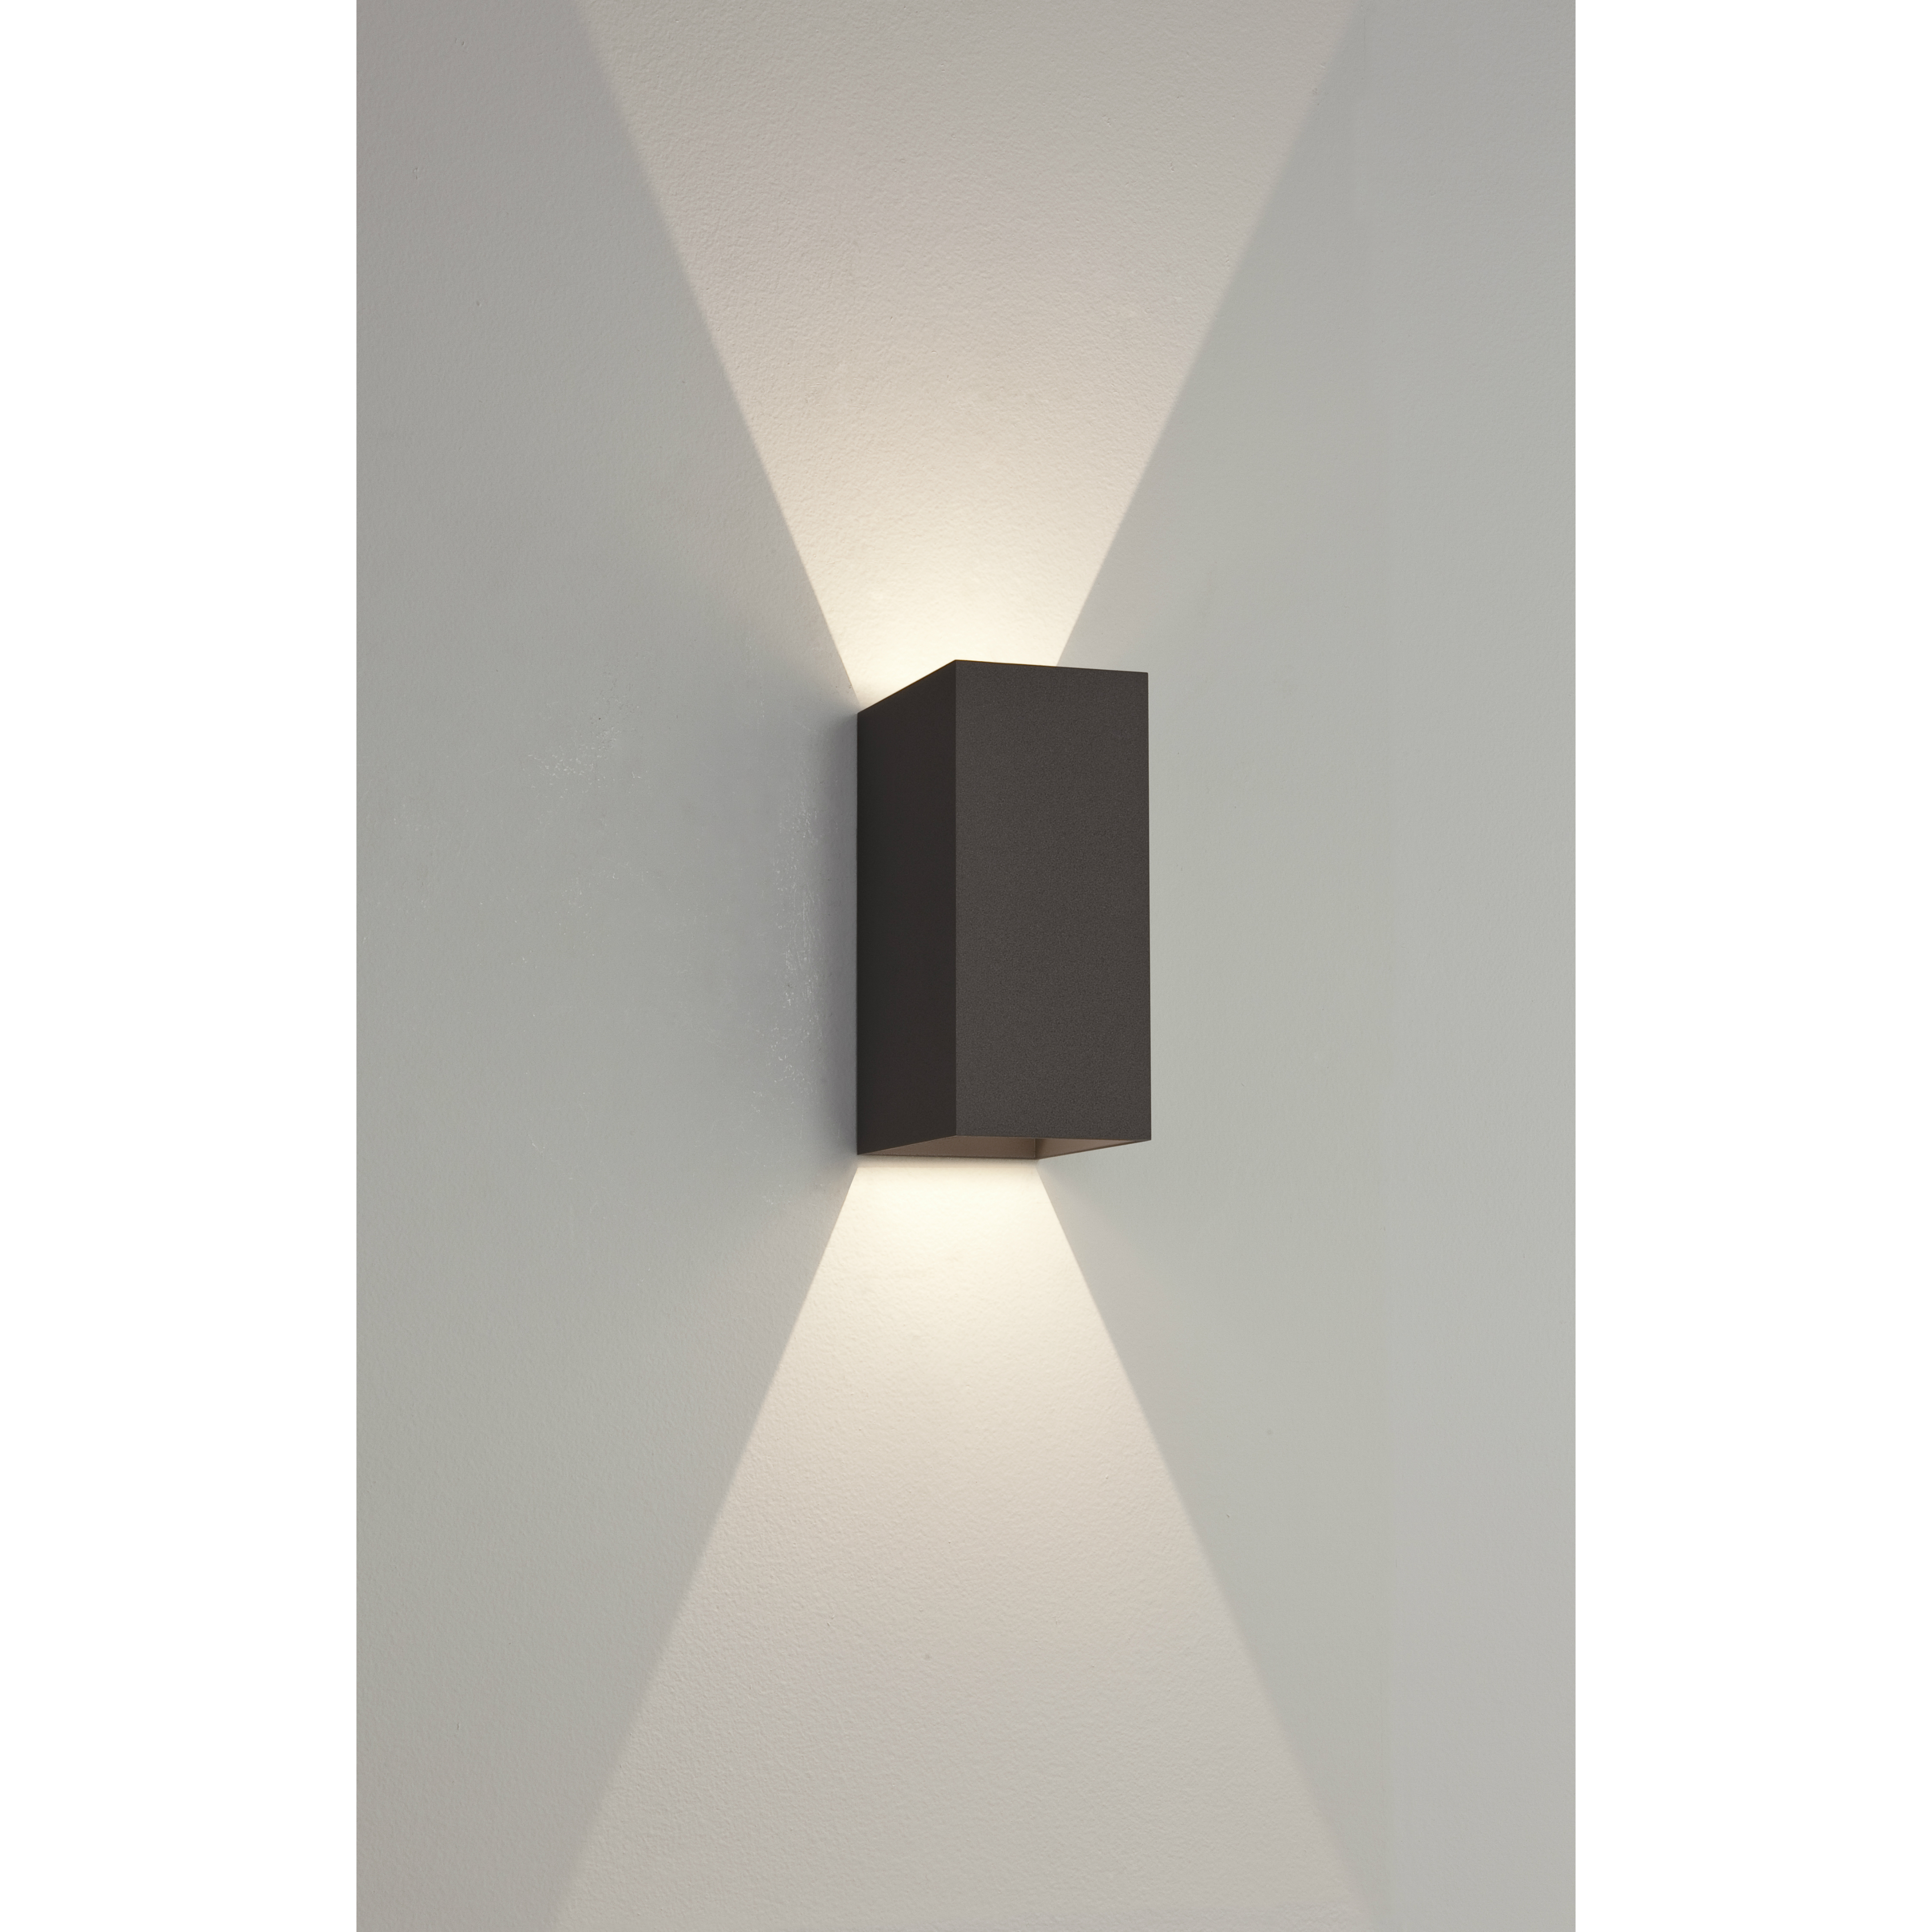 Half wall lanterns lights product categories light innovation oslo 160 black mozeypictures Choice Image